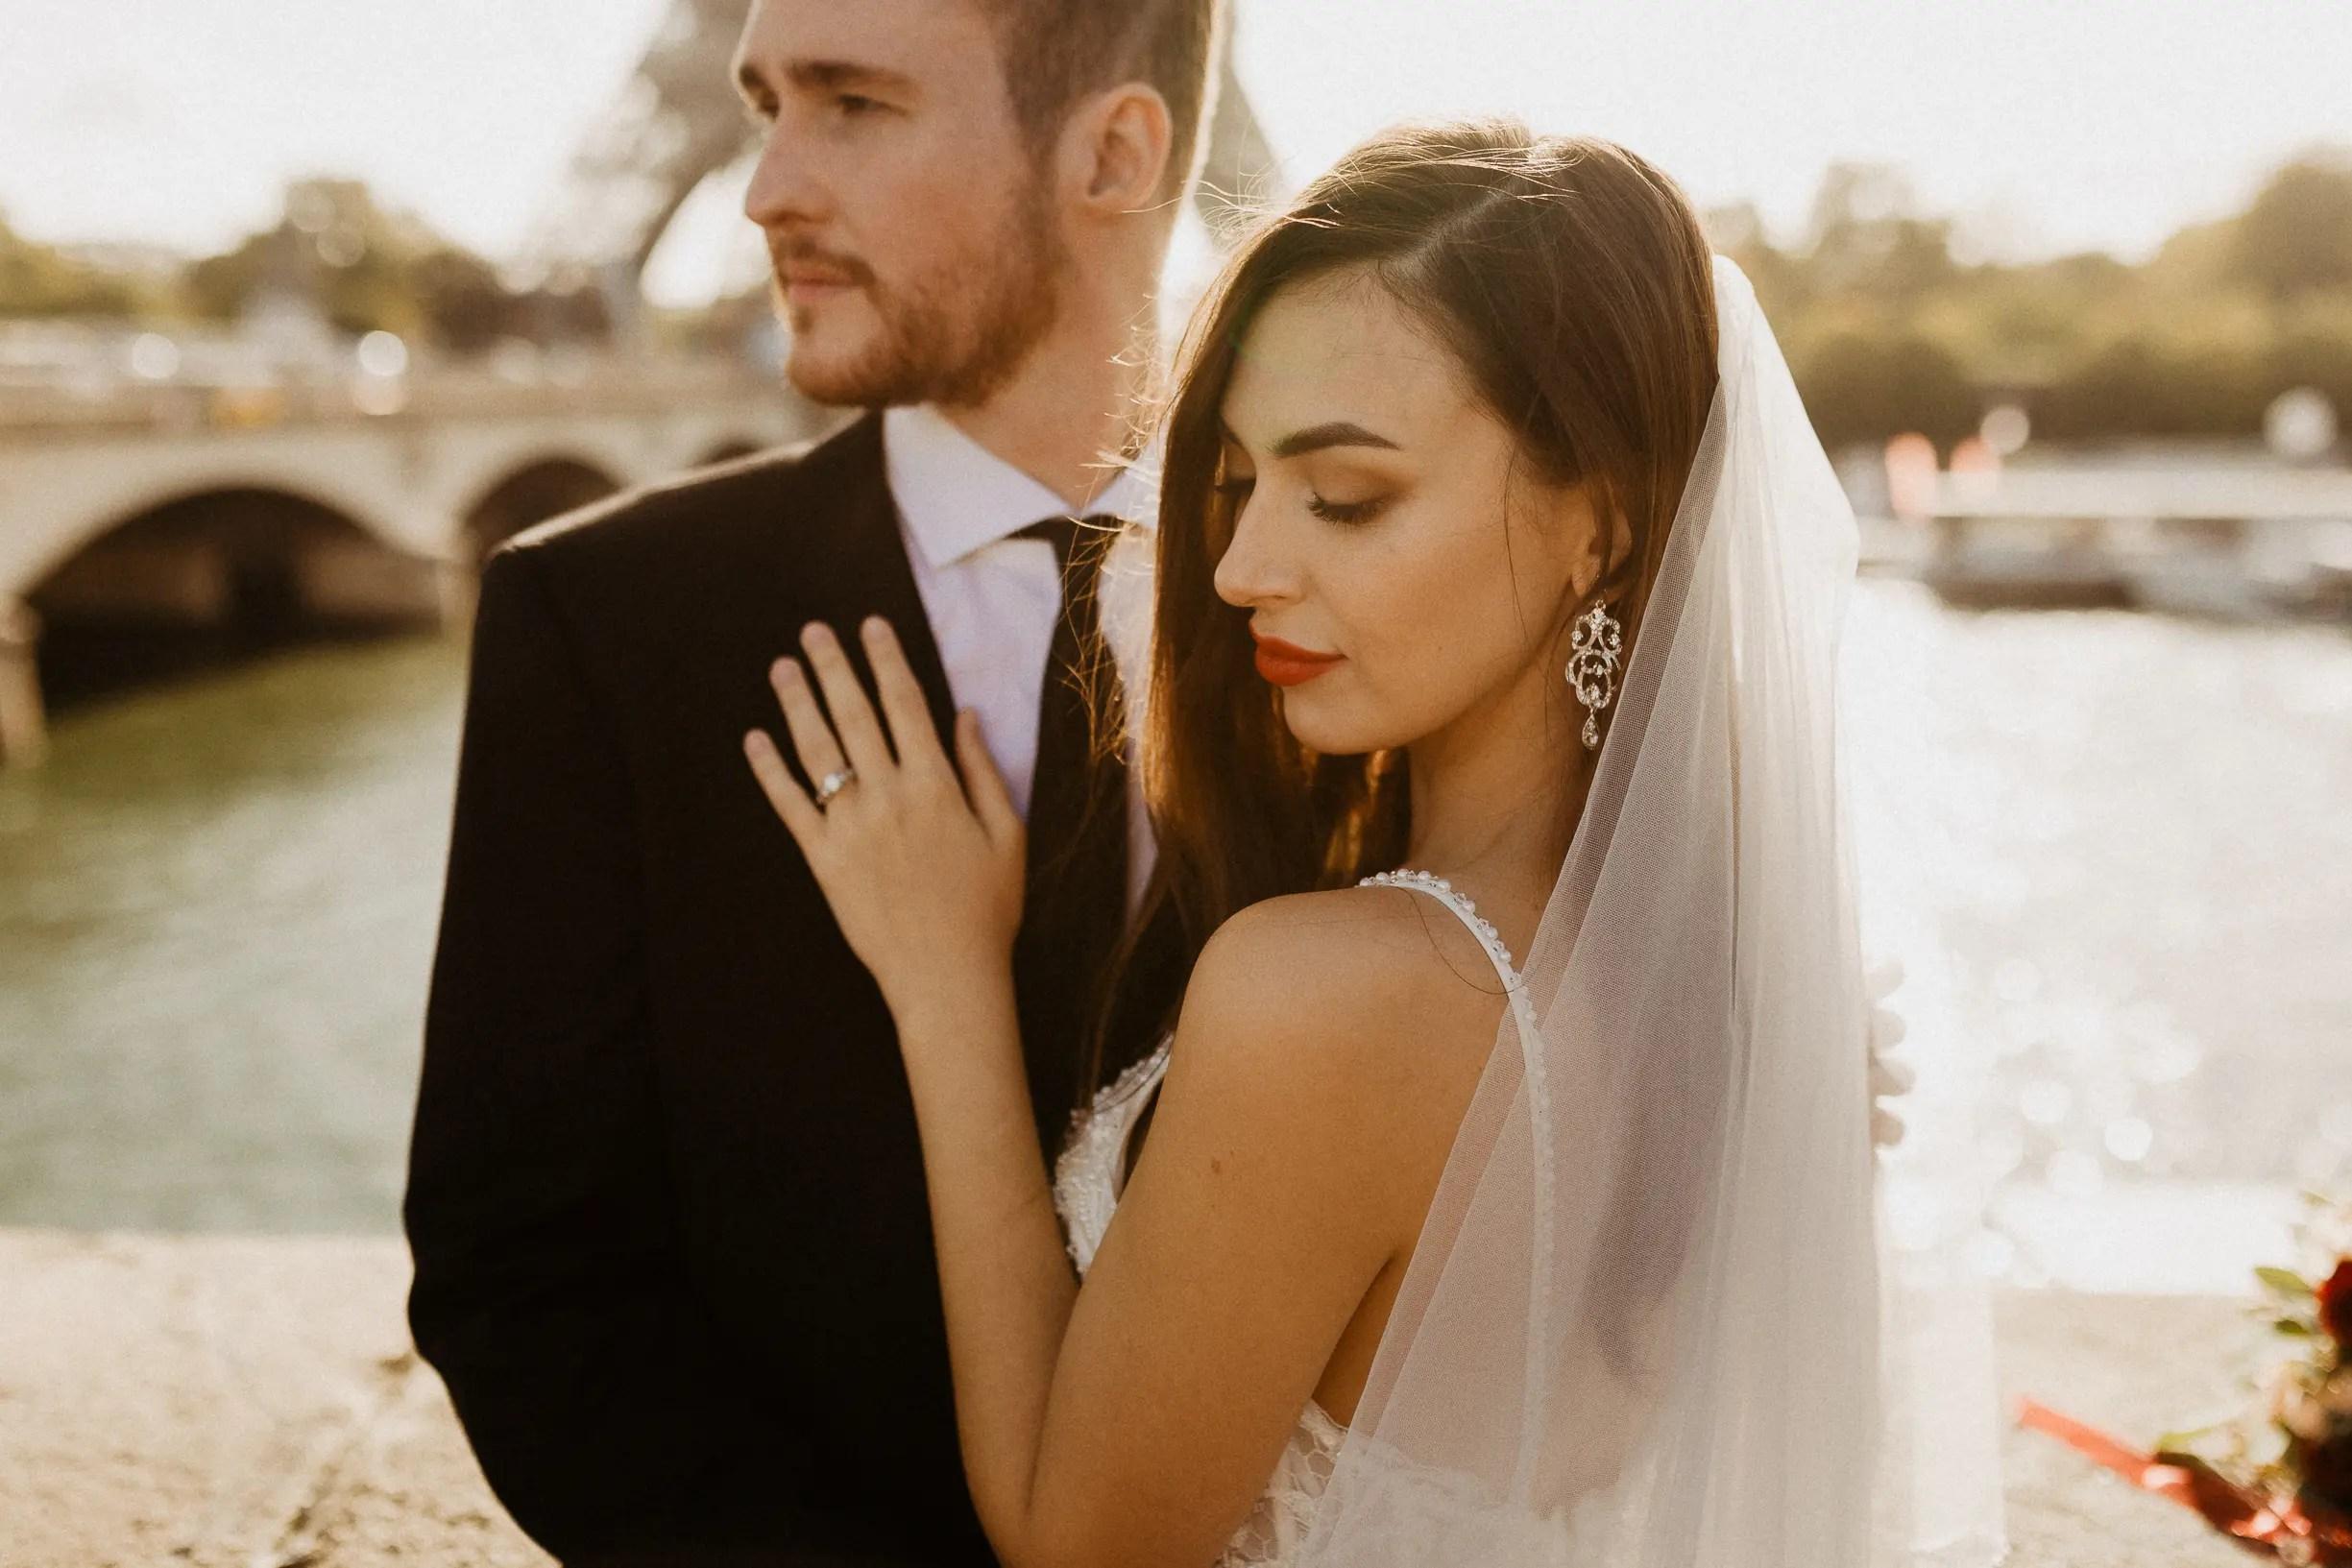 Intimate wedding portrait - paris photographer